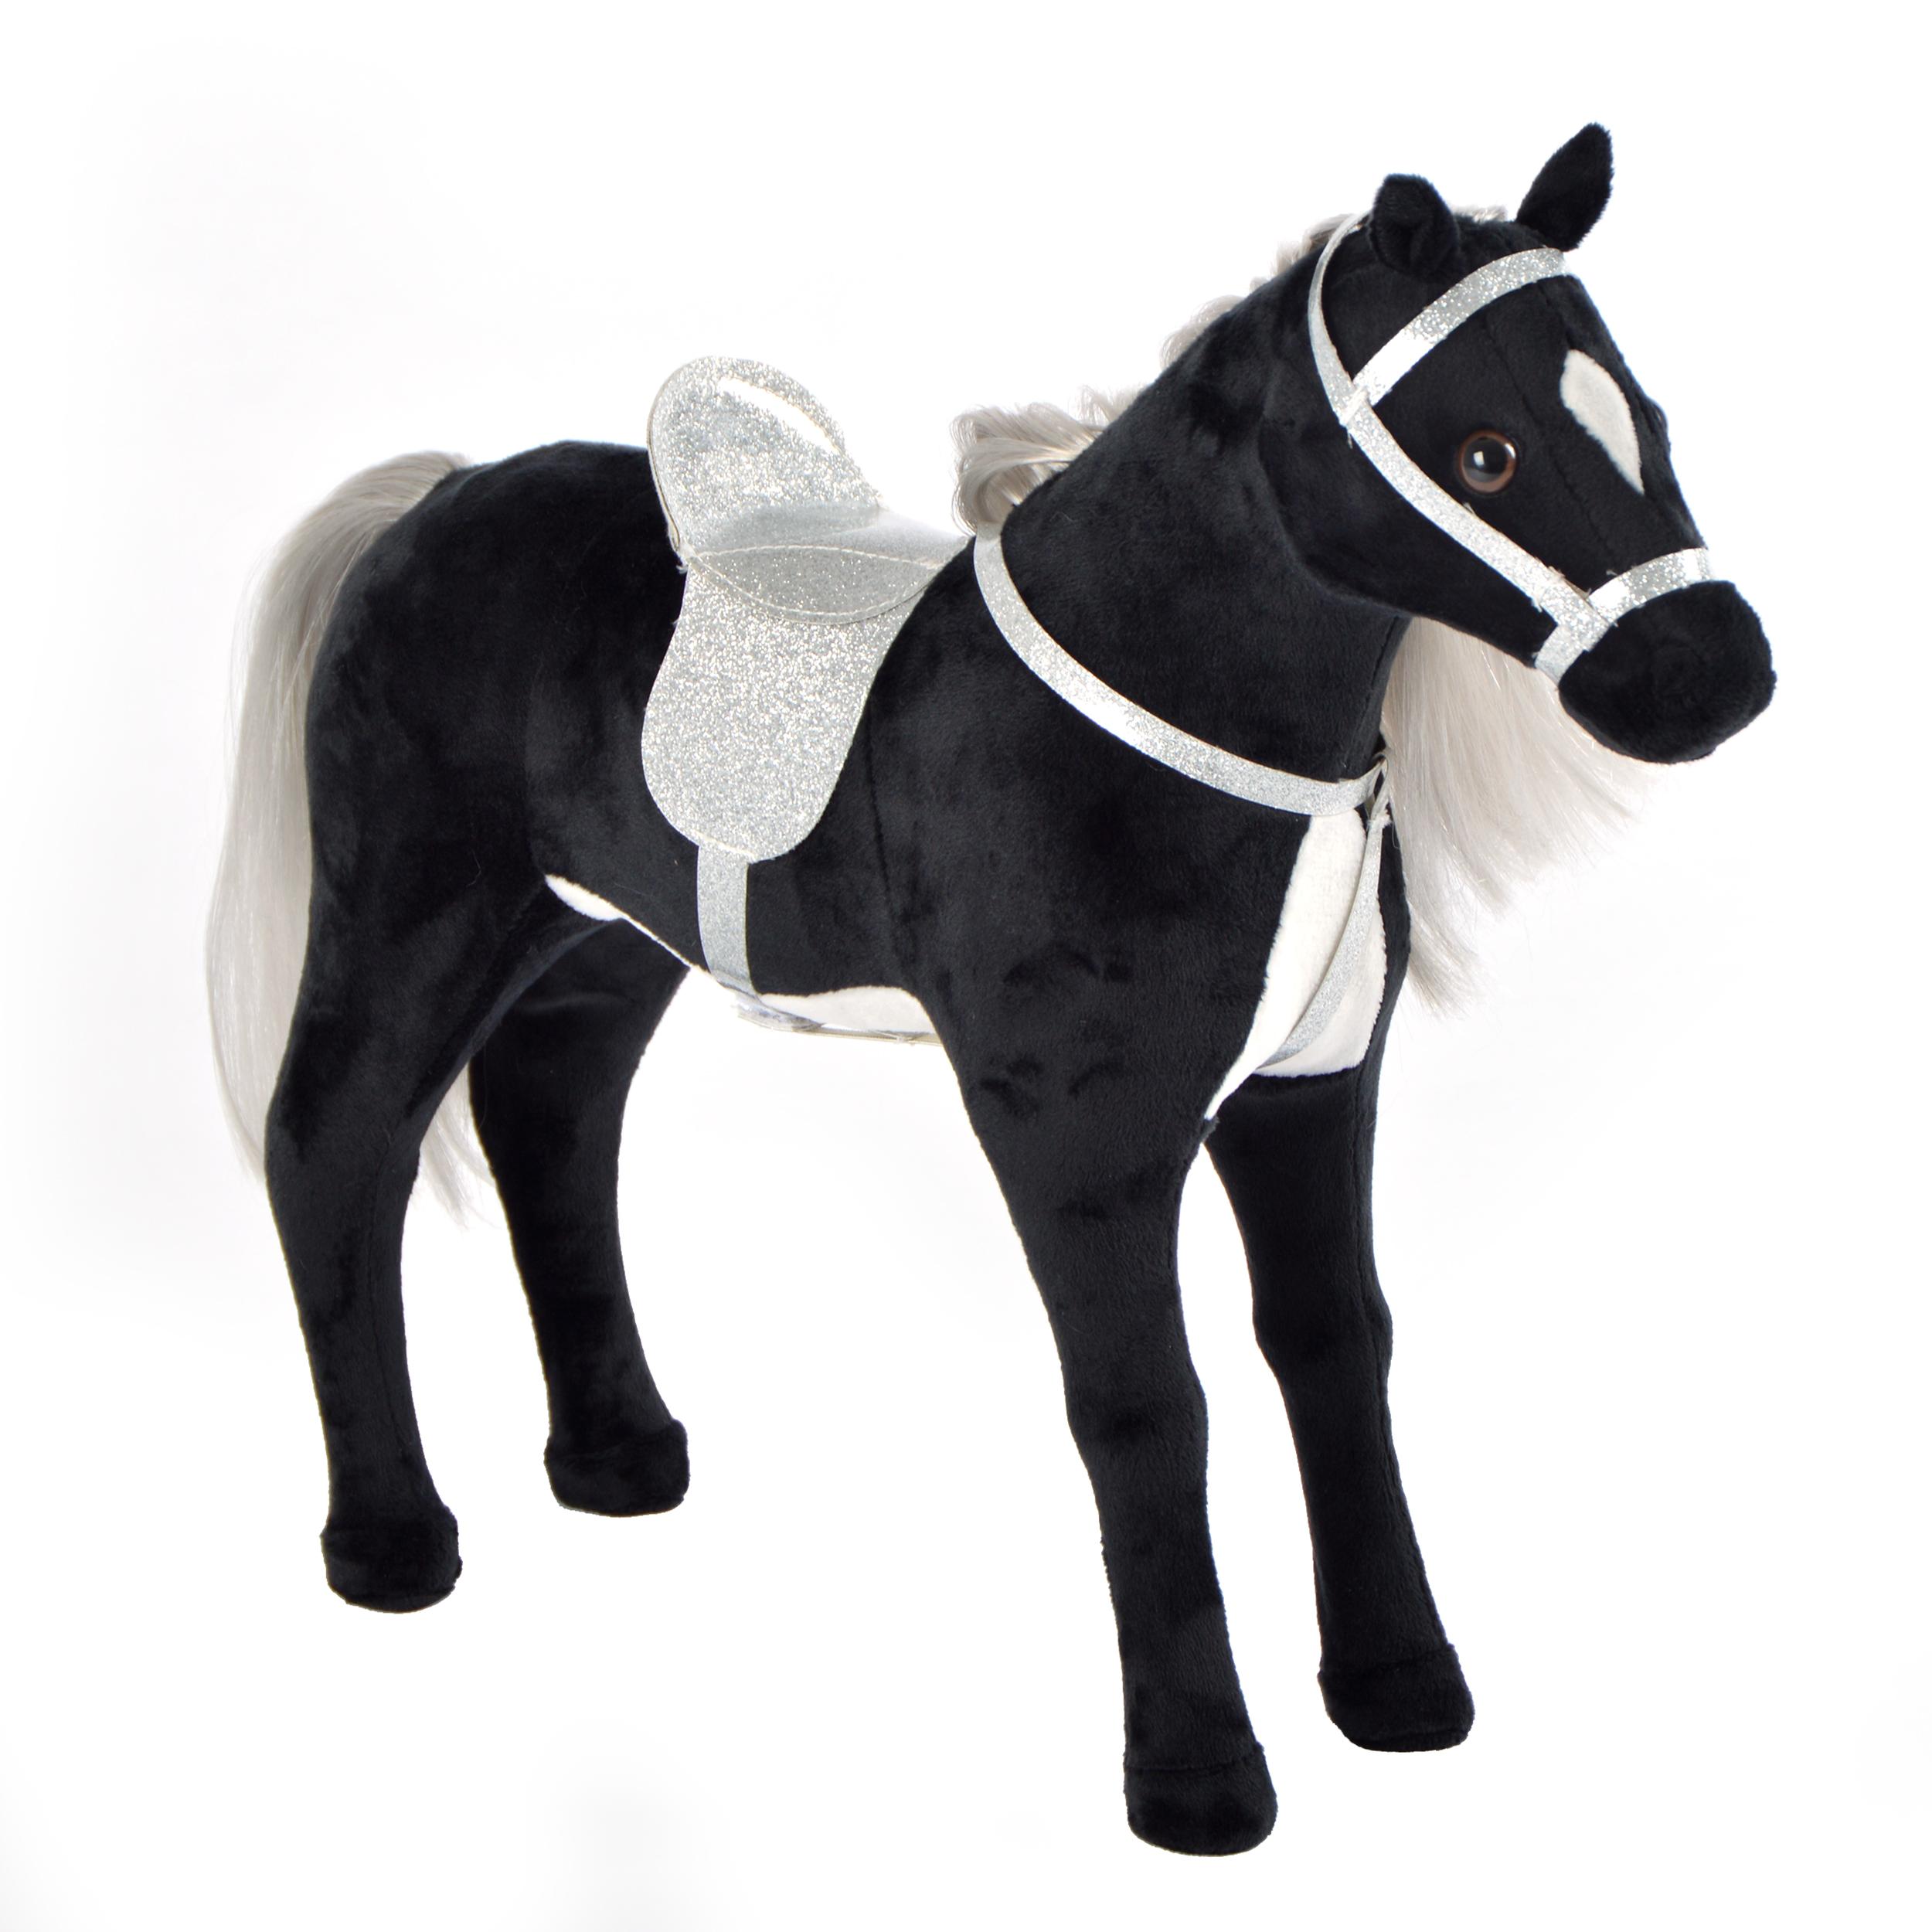 40 cm Pferd, Schwarz - Carmen